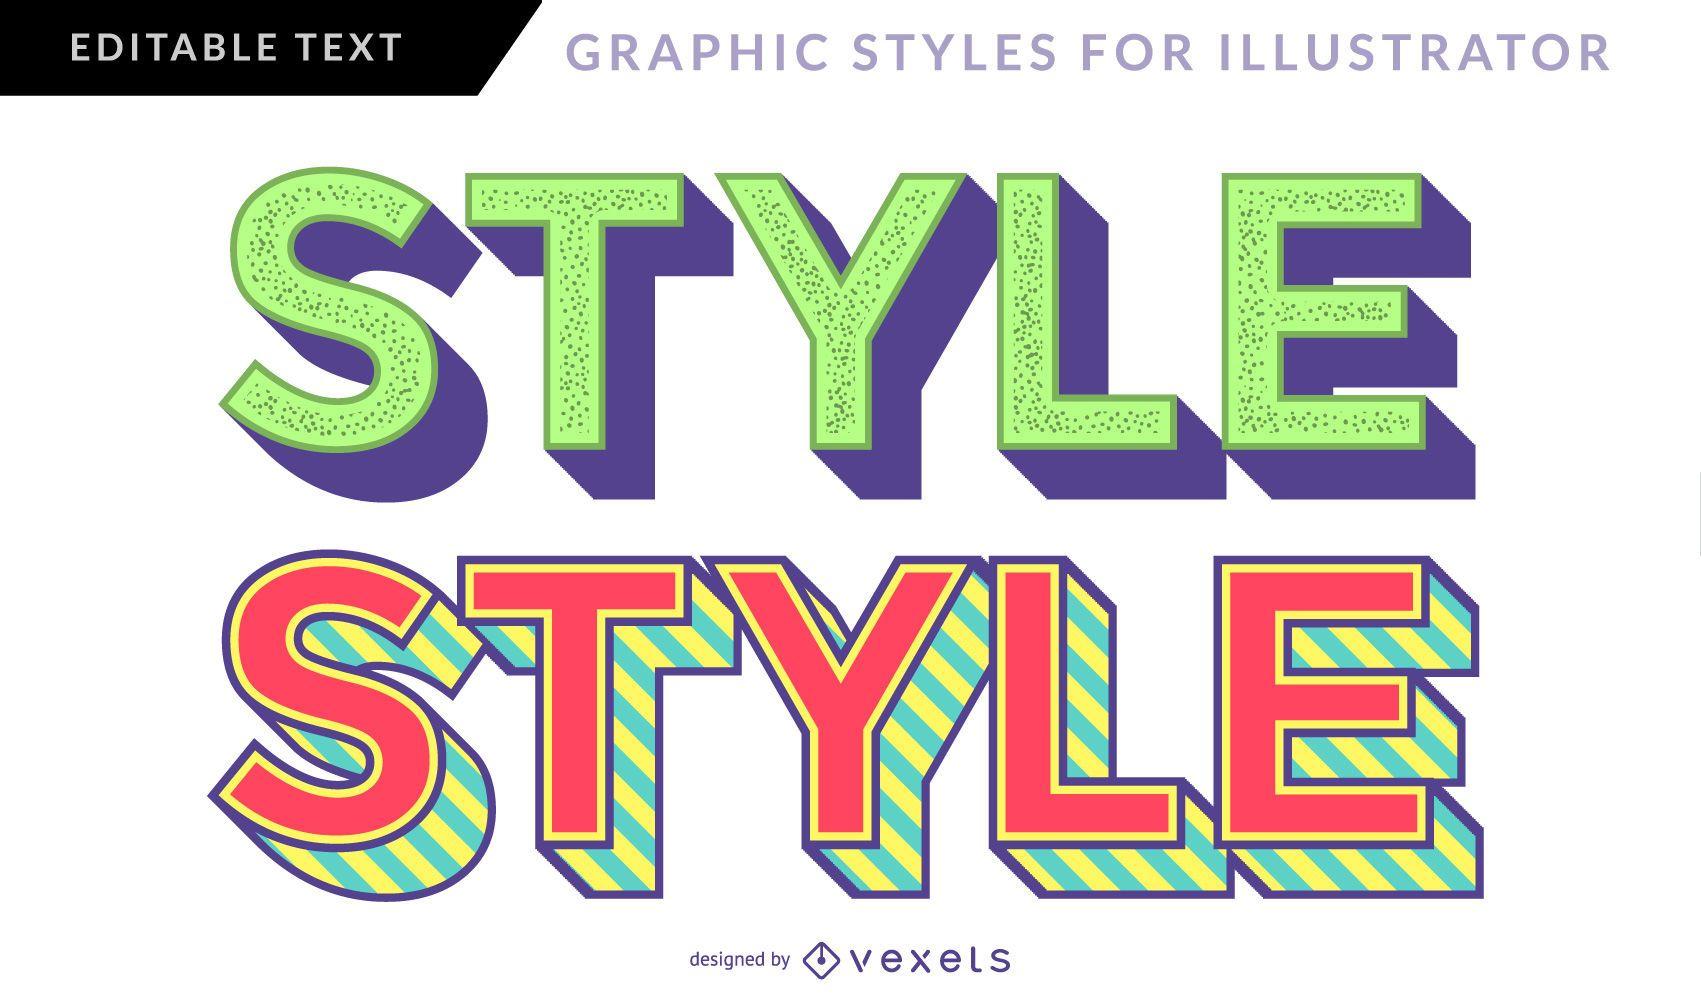 Neon Vintage Graphic Style